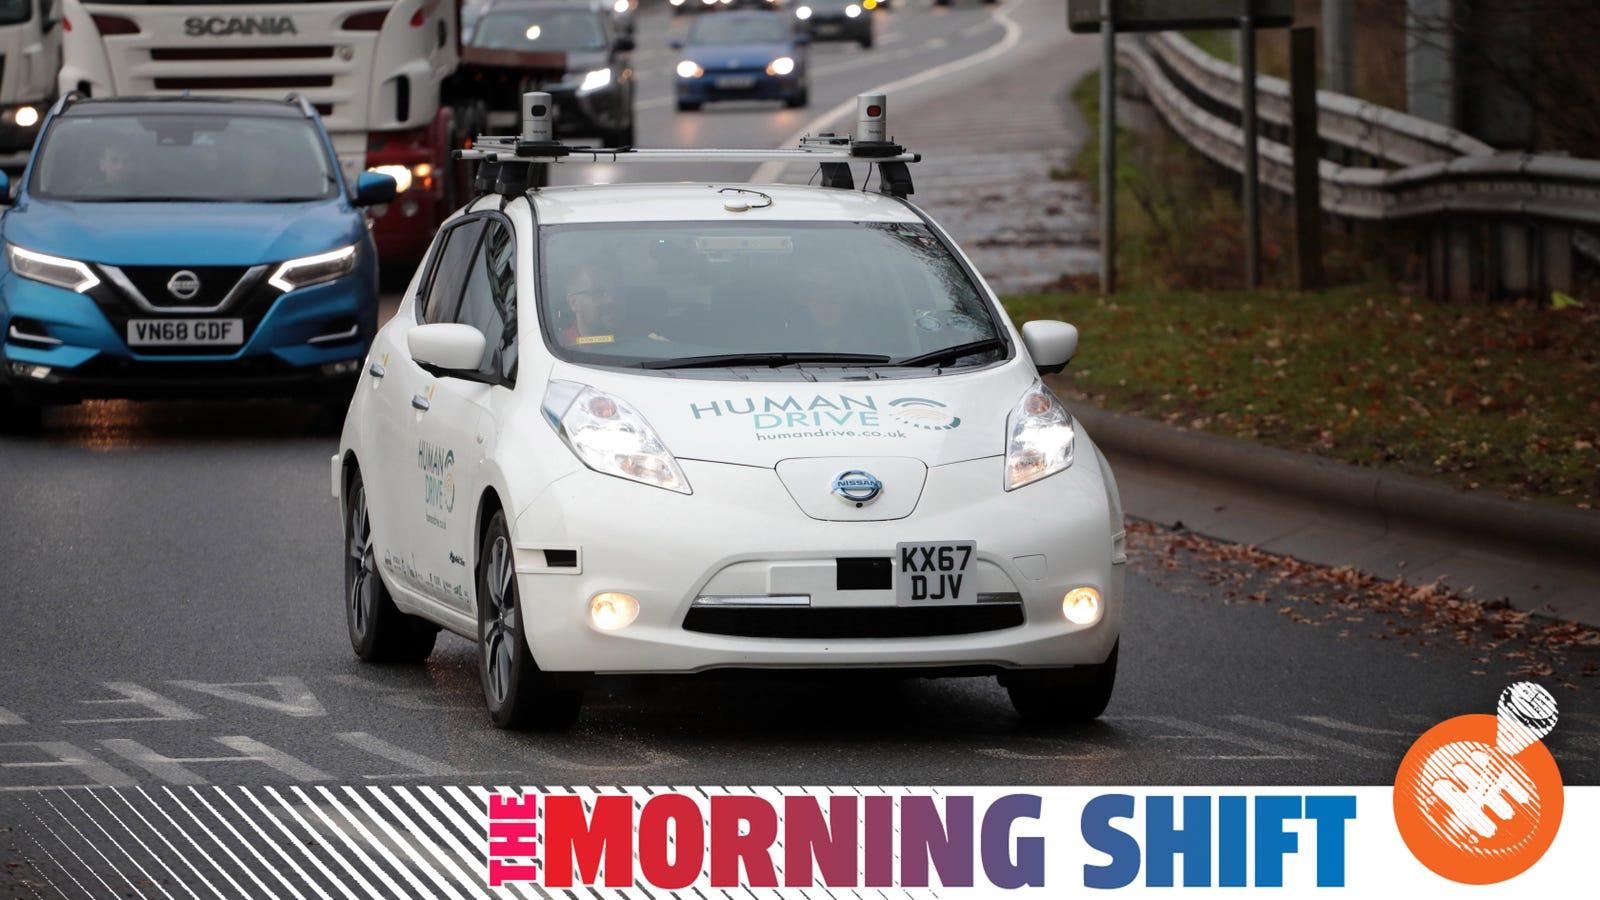 A Nissan Leaf Just Finished A 230-Mile Autonomous Trip In Britain